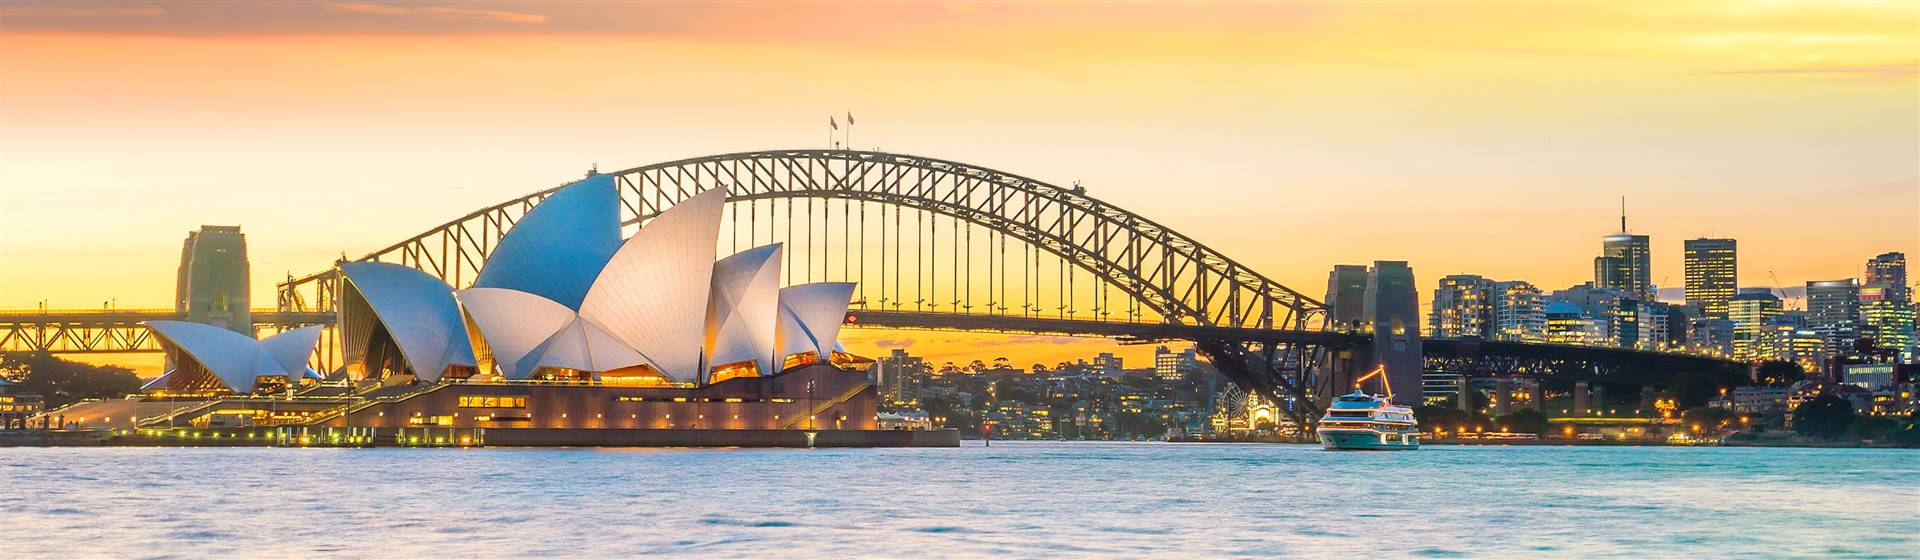 "<img src=""australia-shutterstock_662769640.jpeg"" alt=""Australiia""/>"